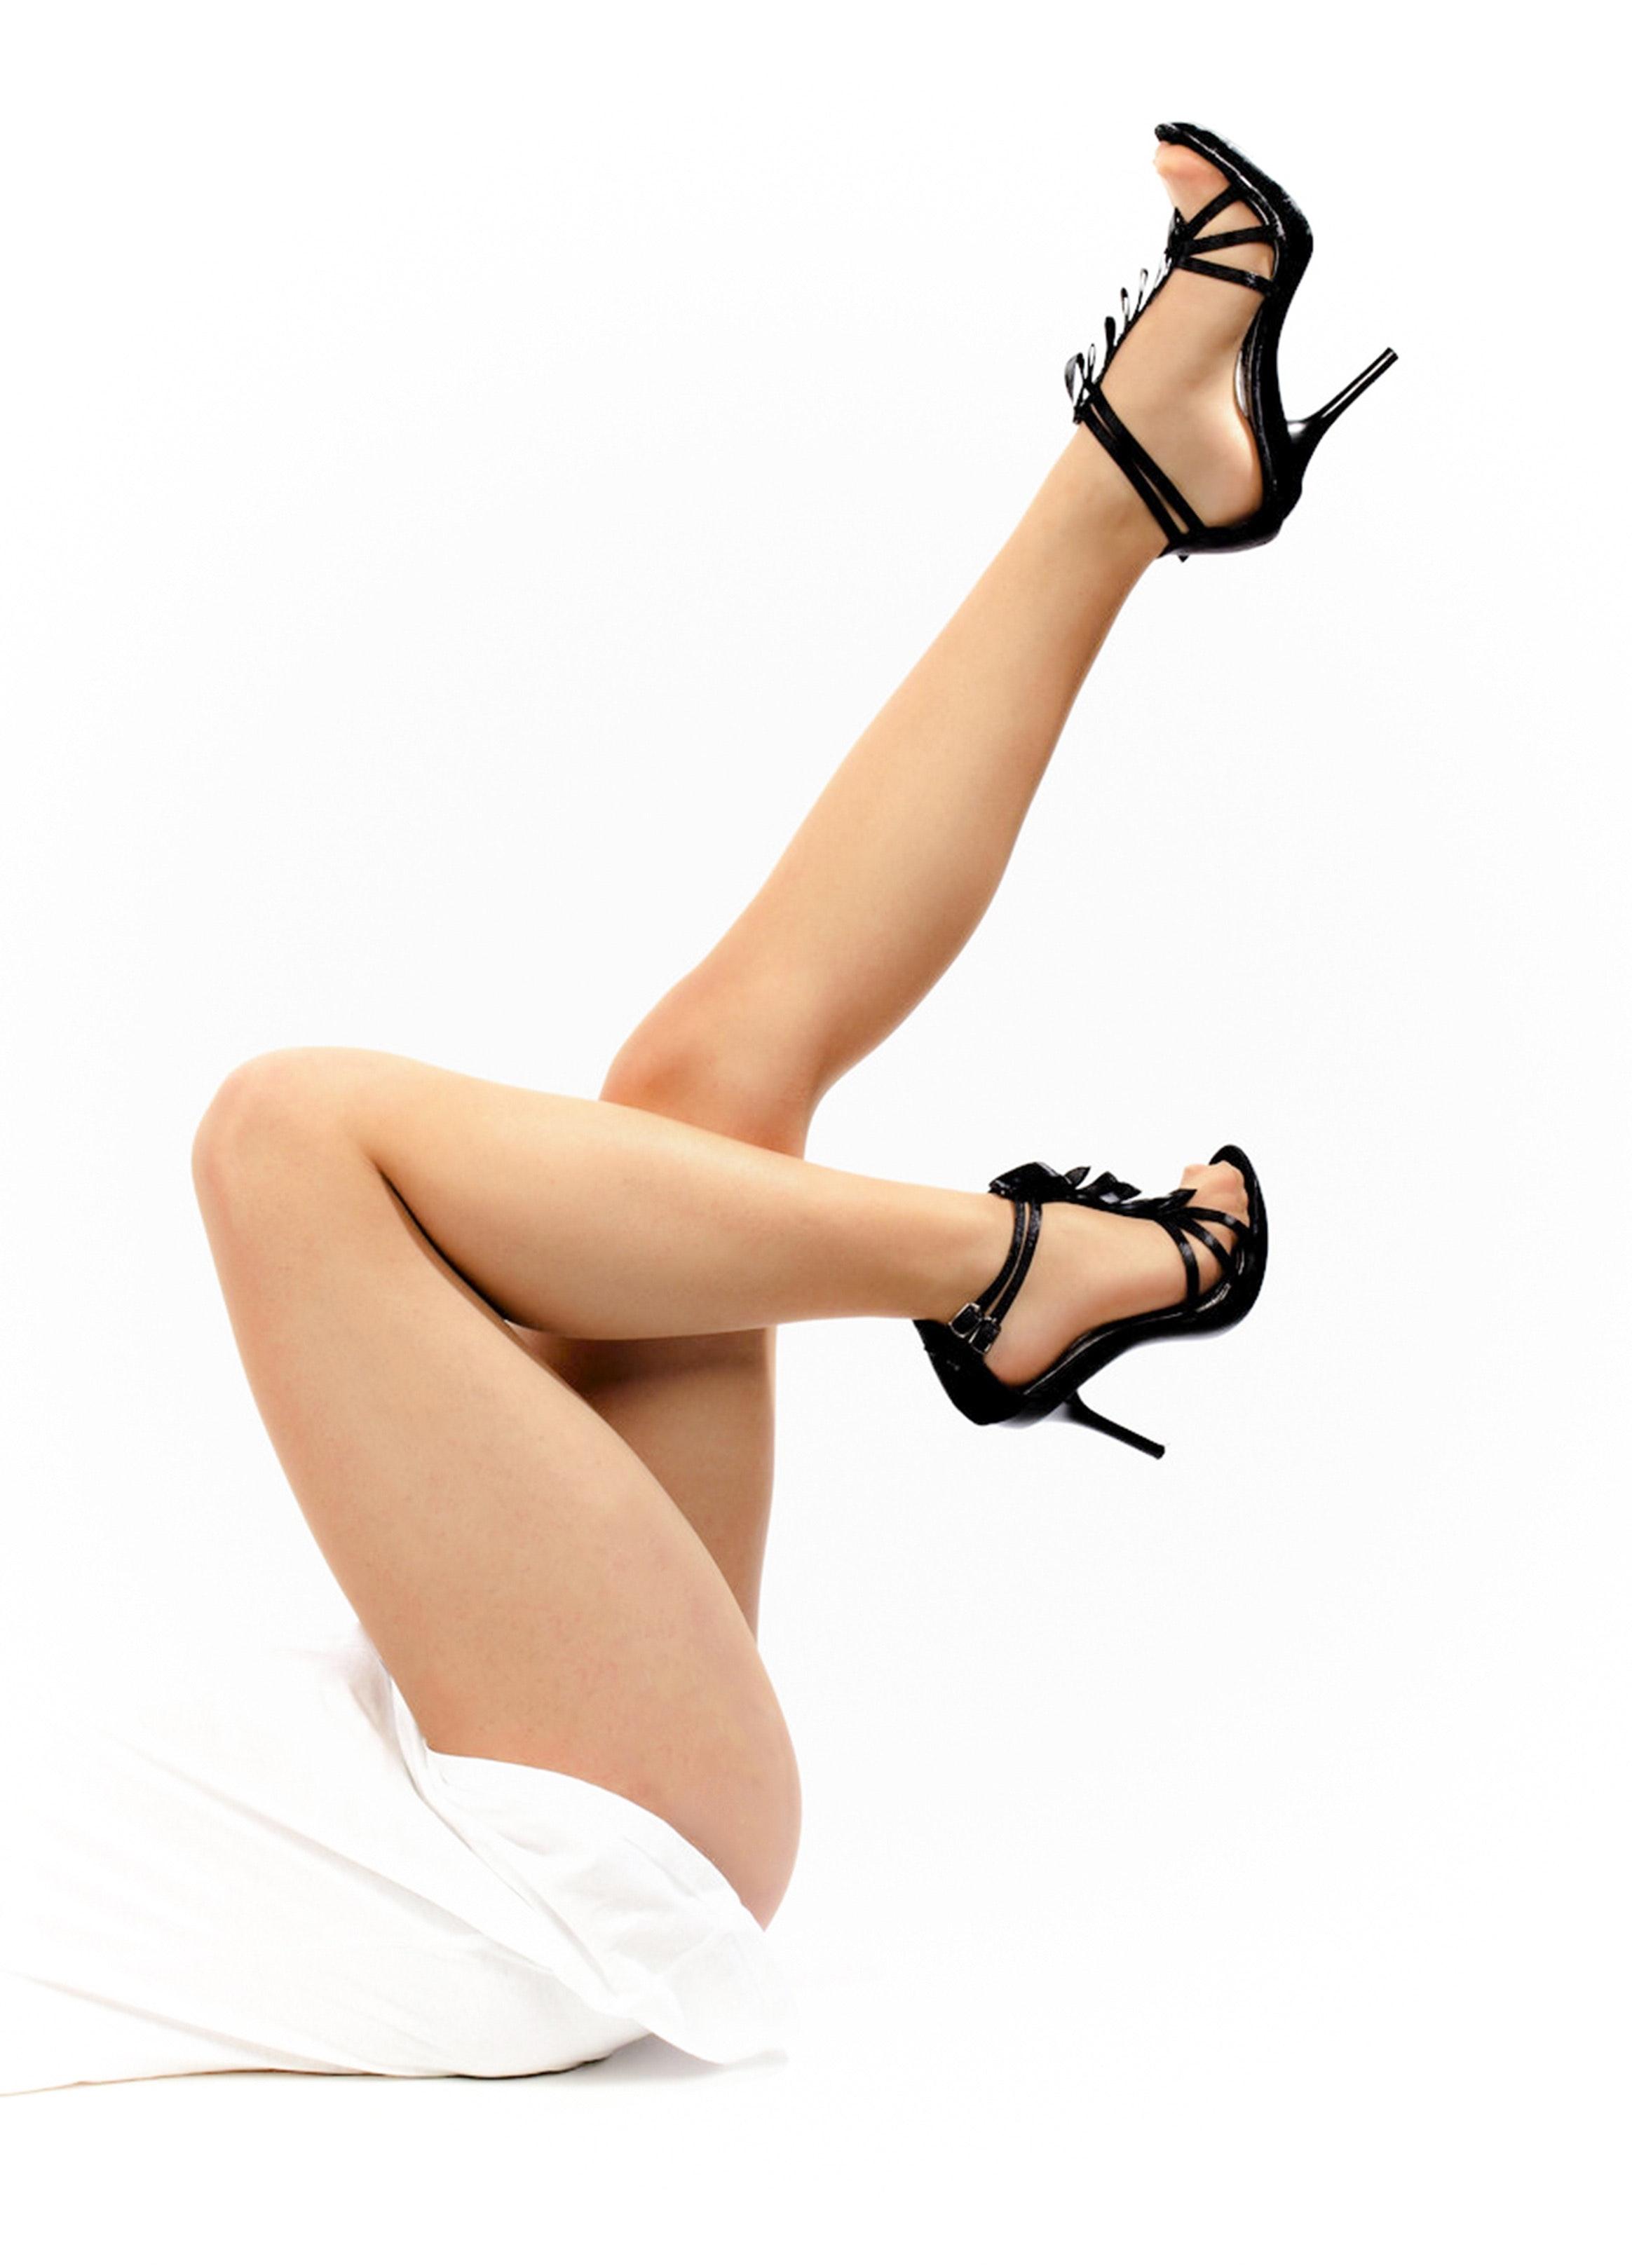 Woman's legs on white background photo